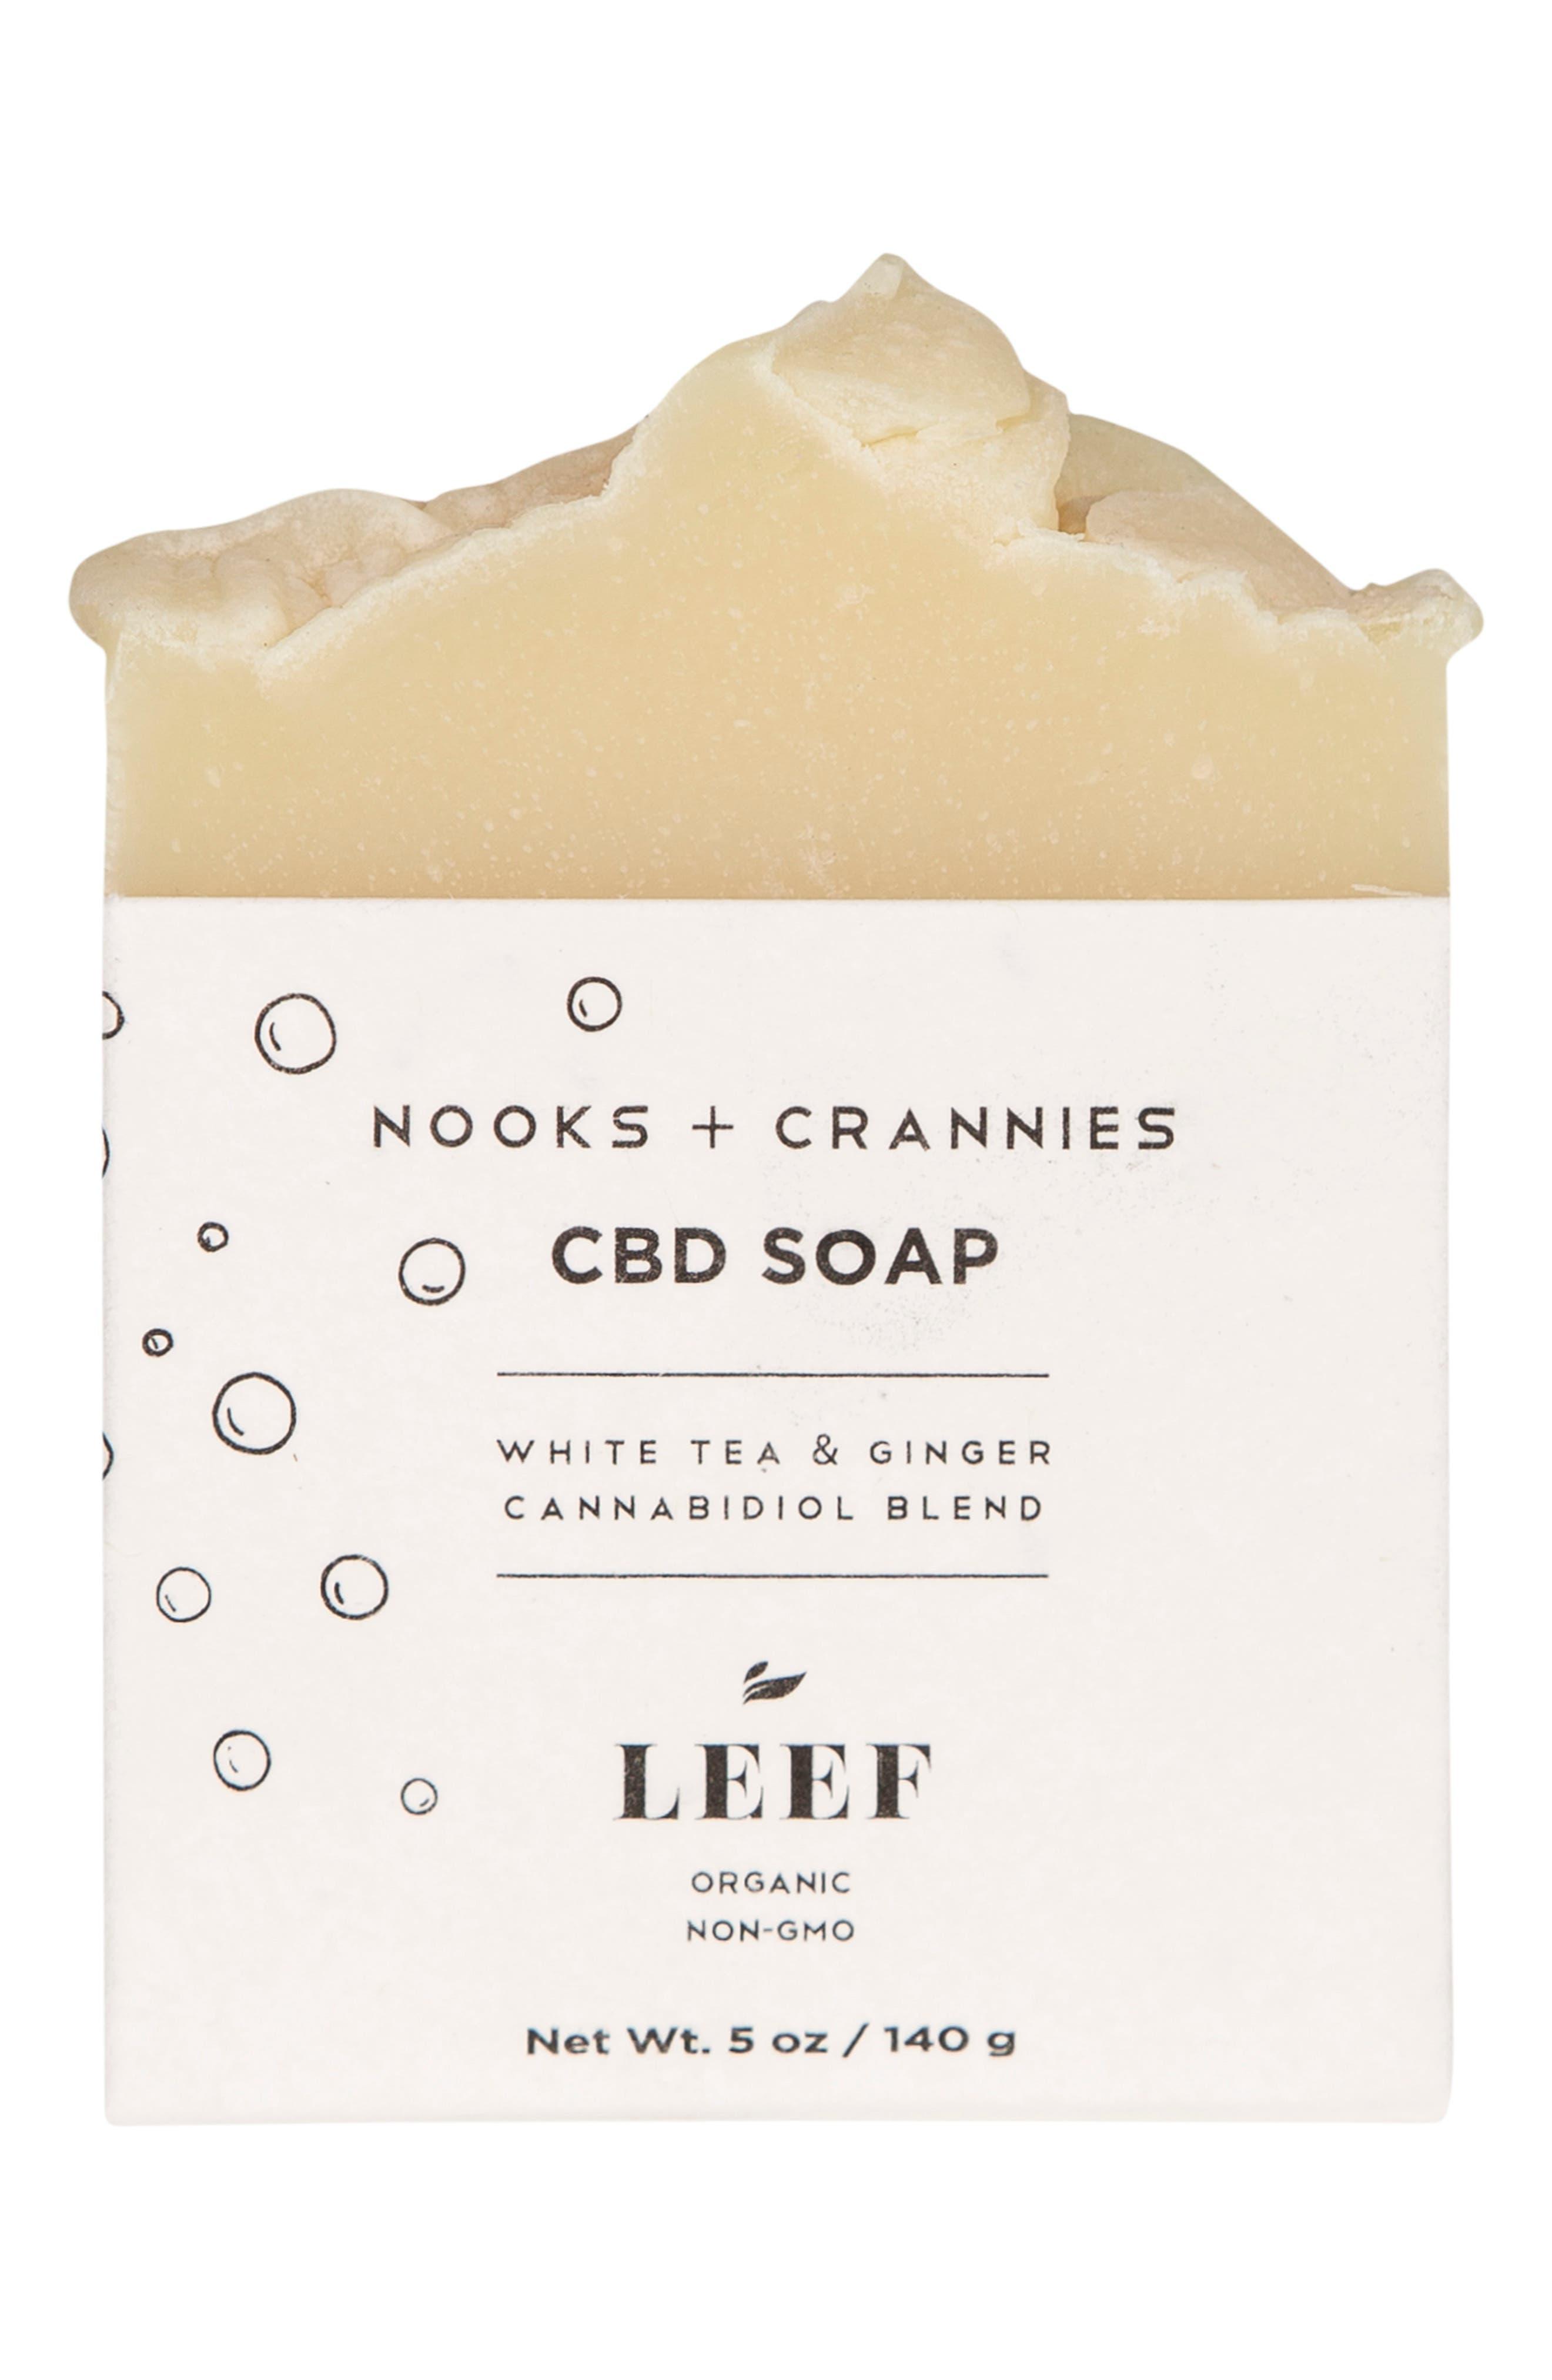 Nooks + Crannies Cbd Soap